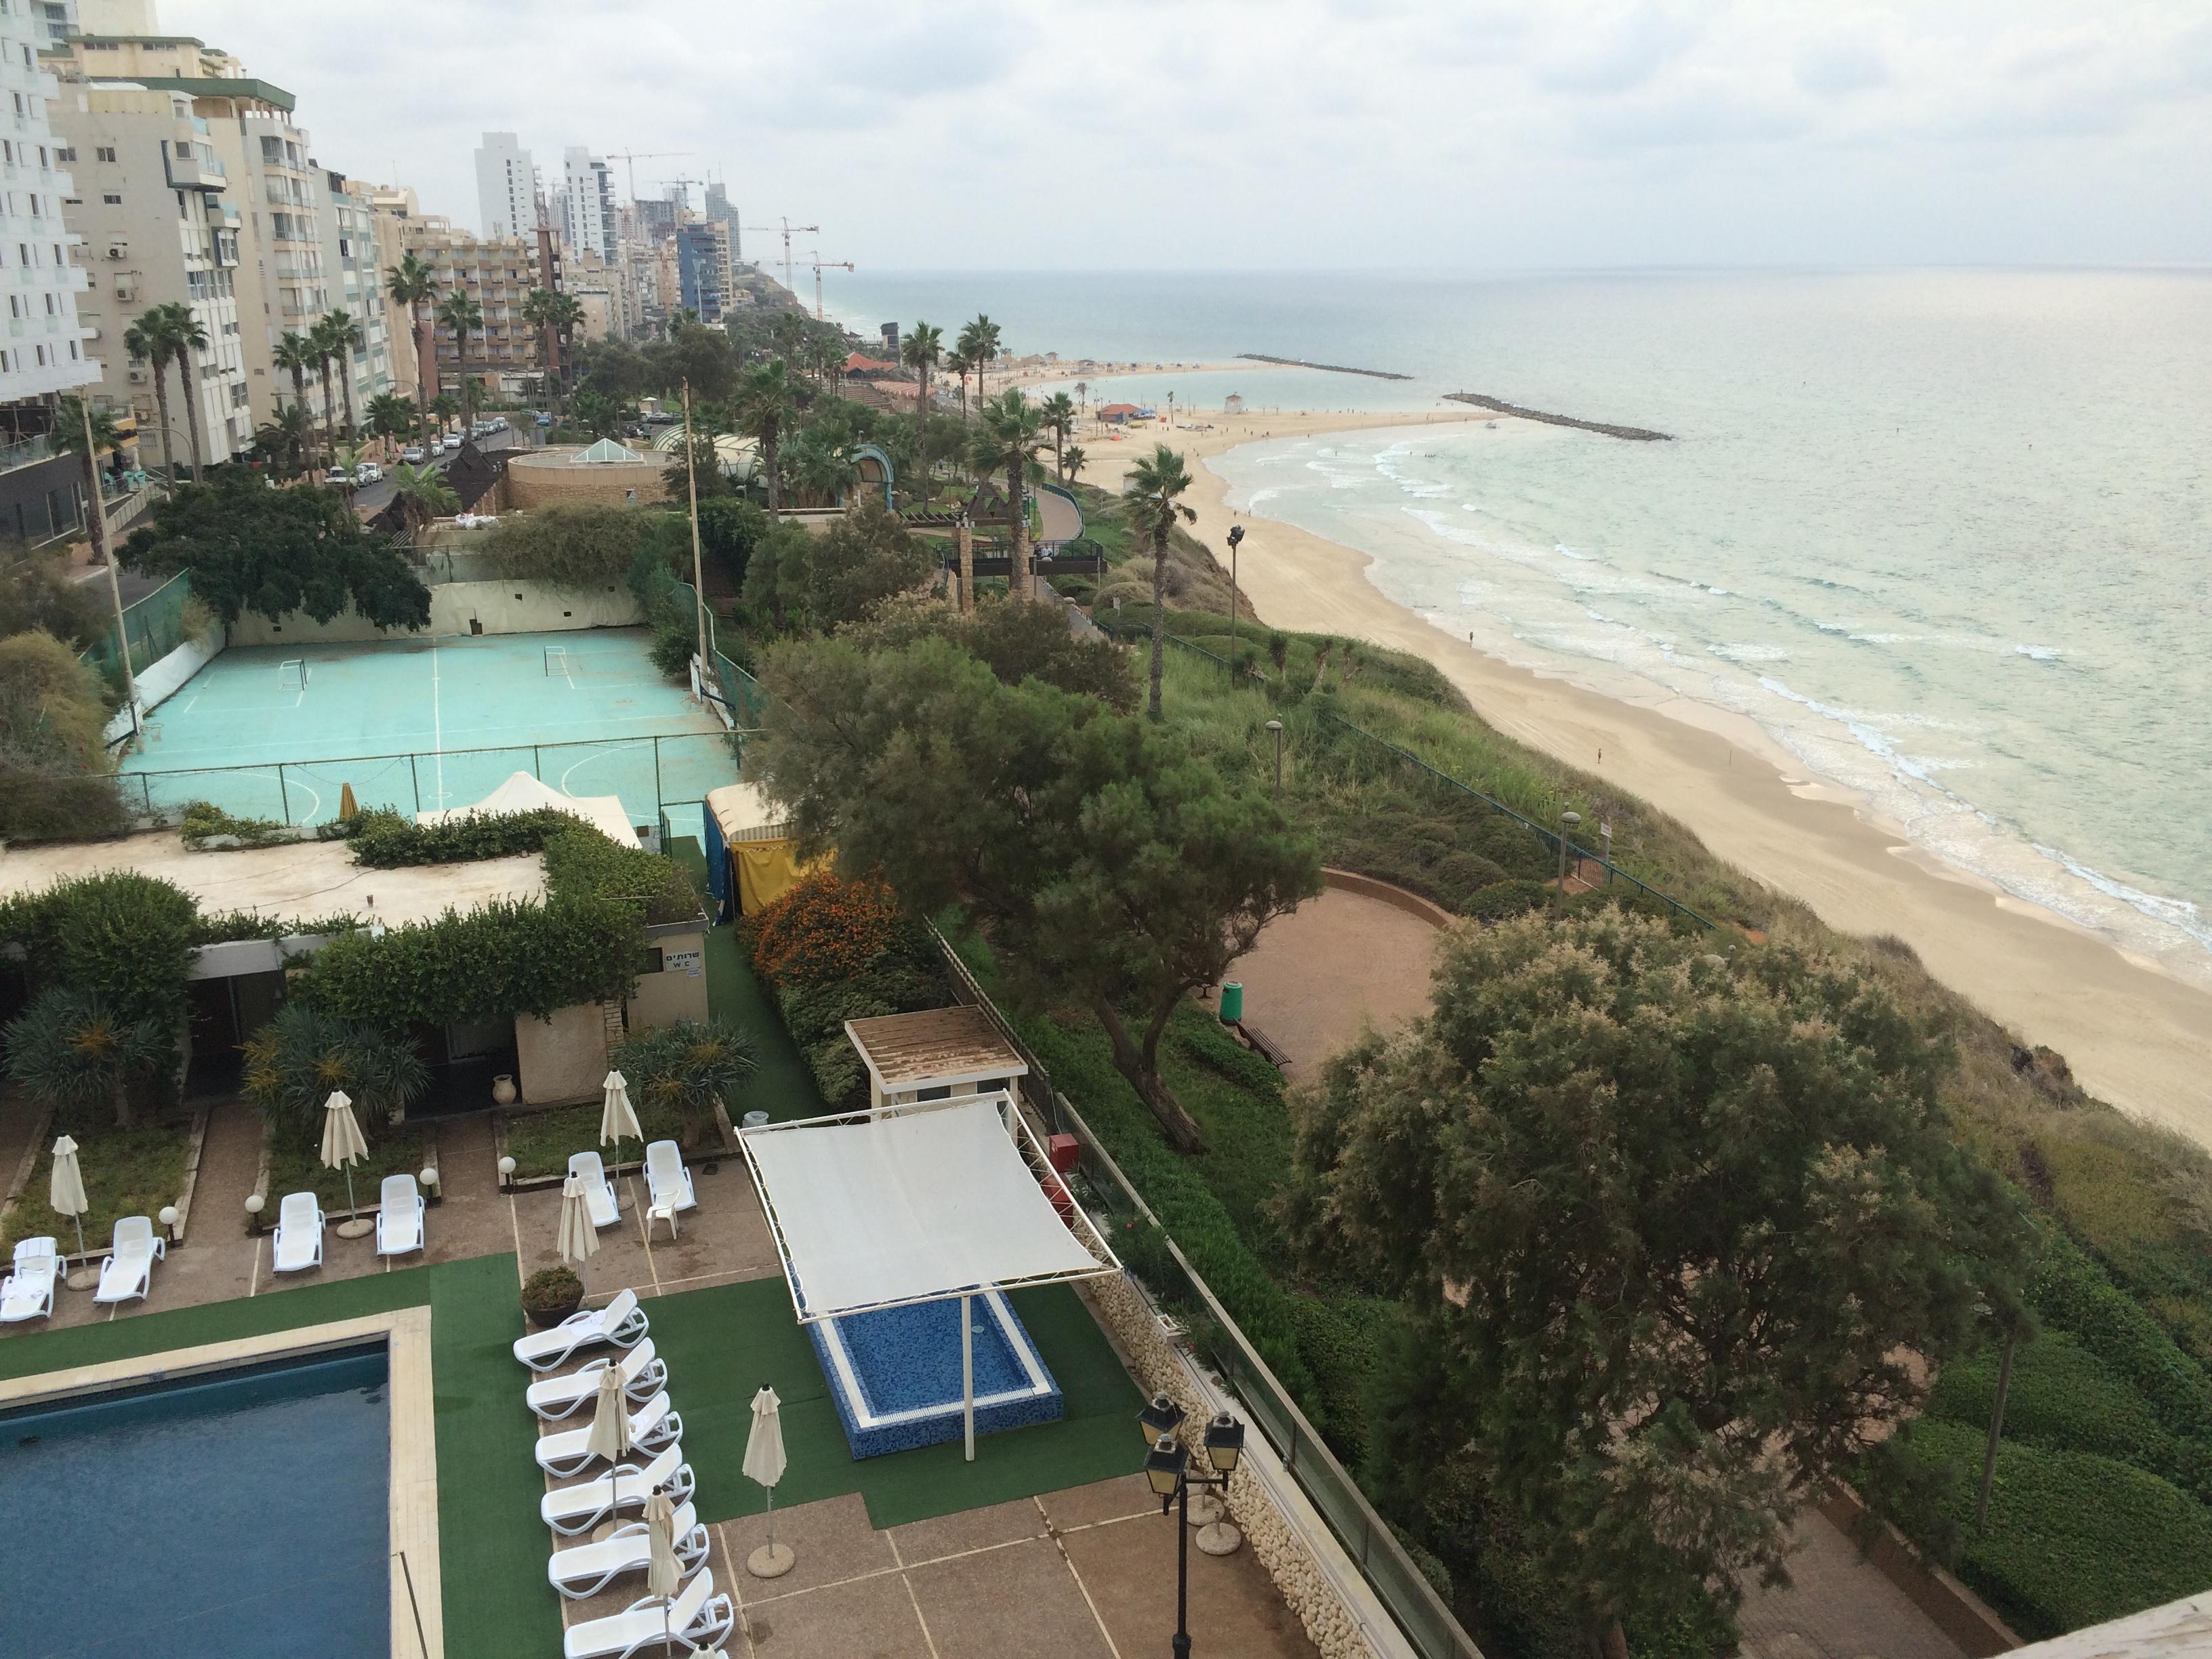 From hotel in Netanya